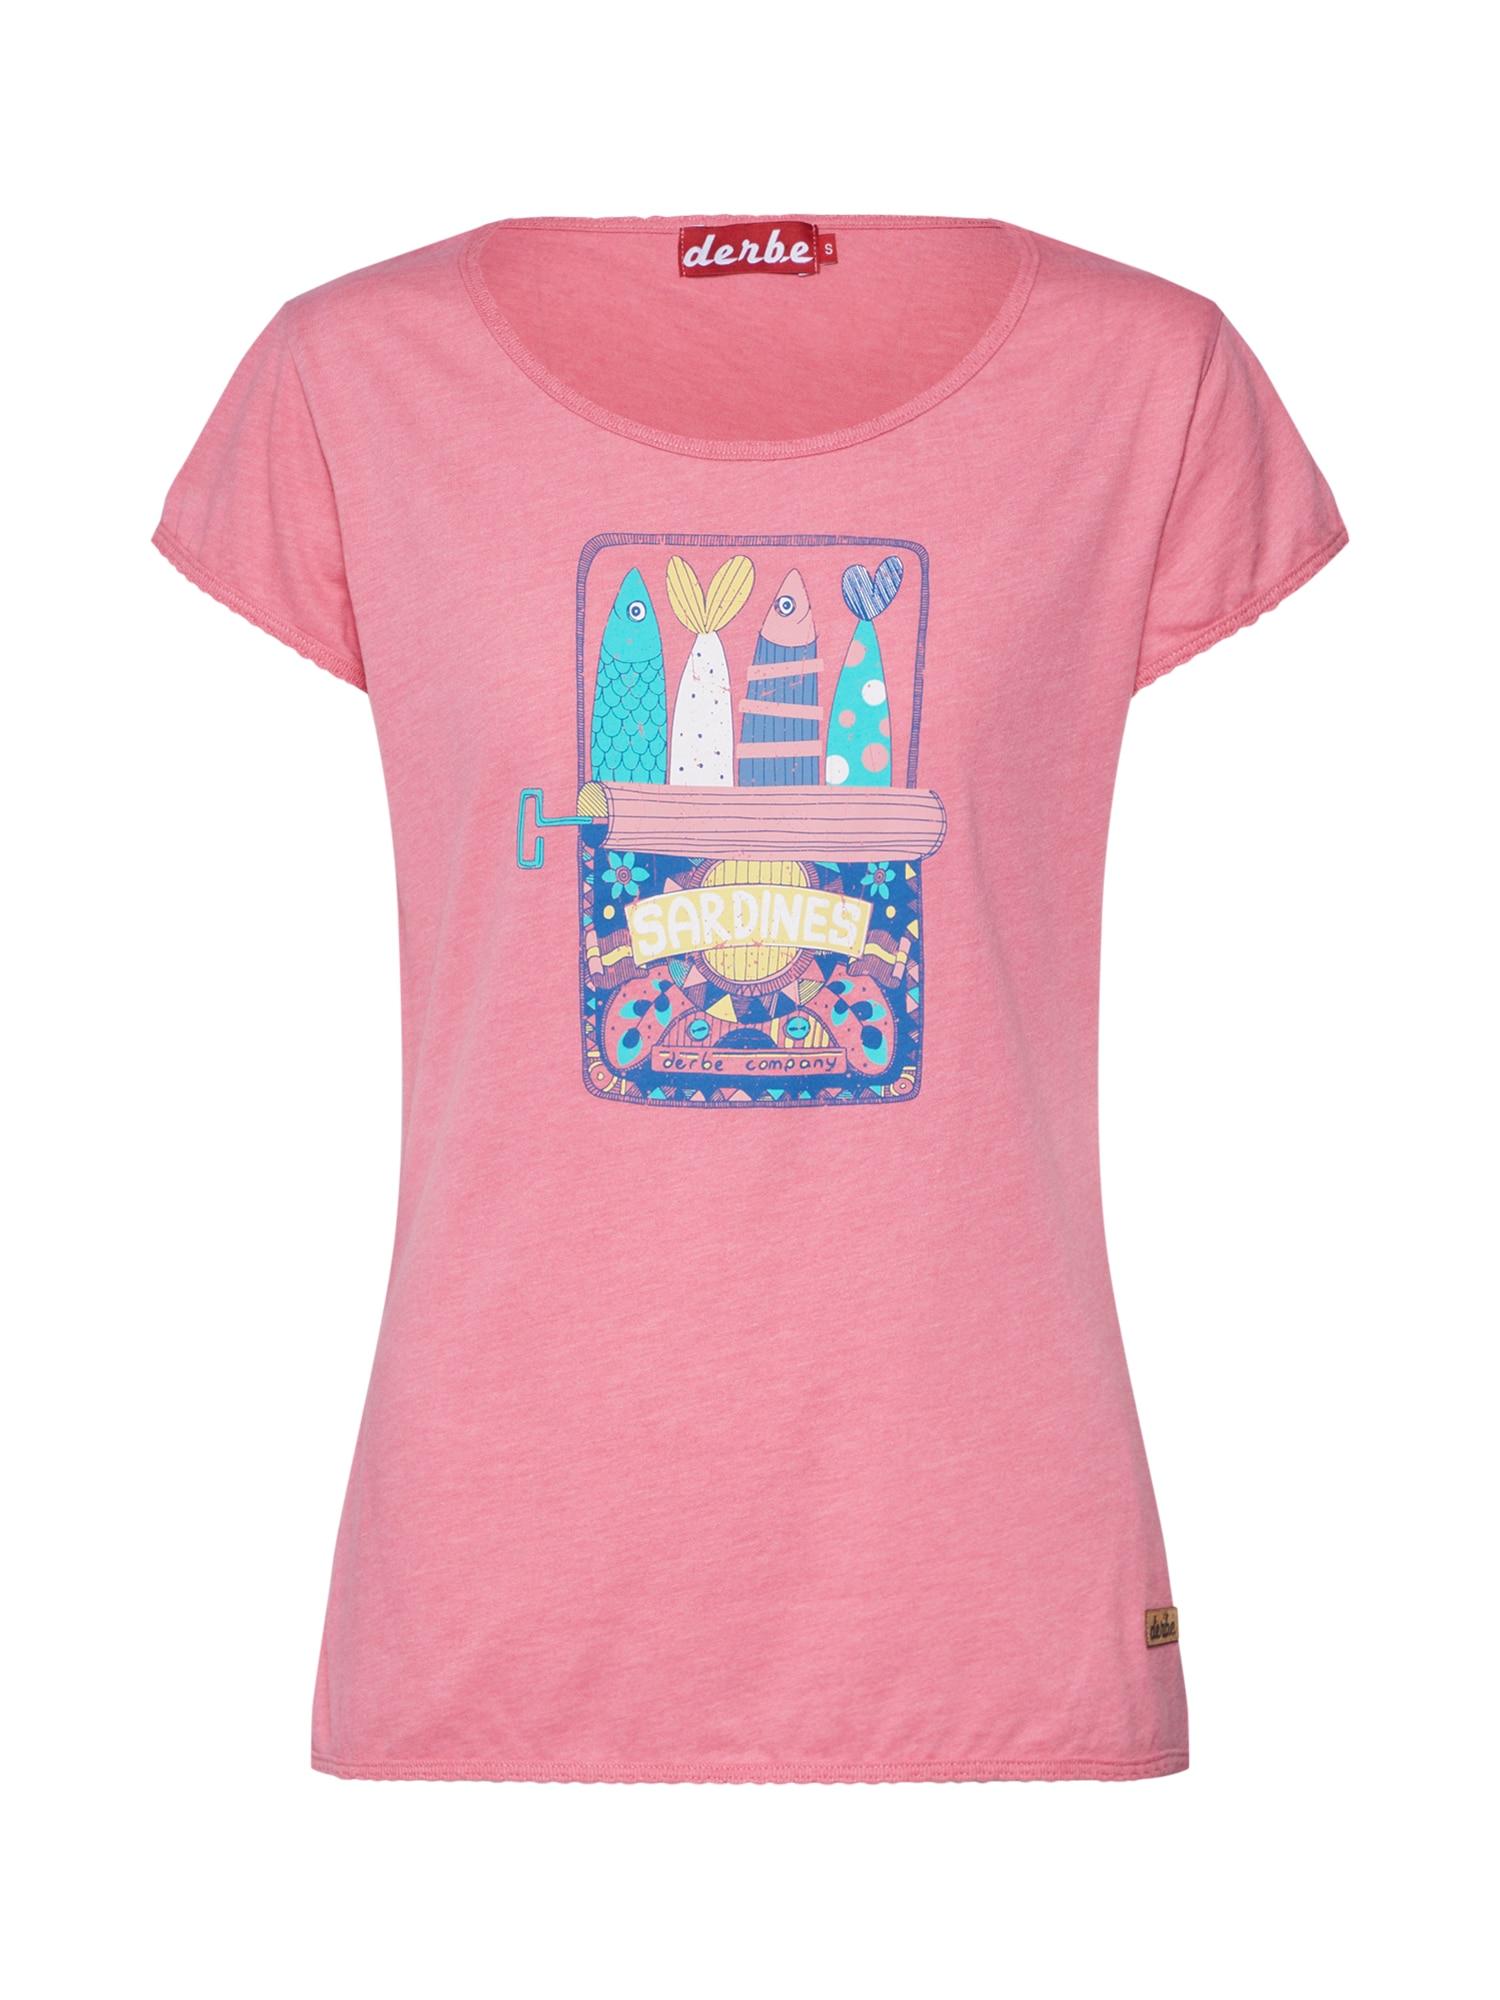 Tričko Sardines pink růžová Derbe